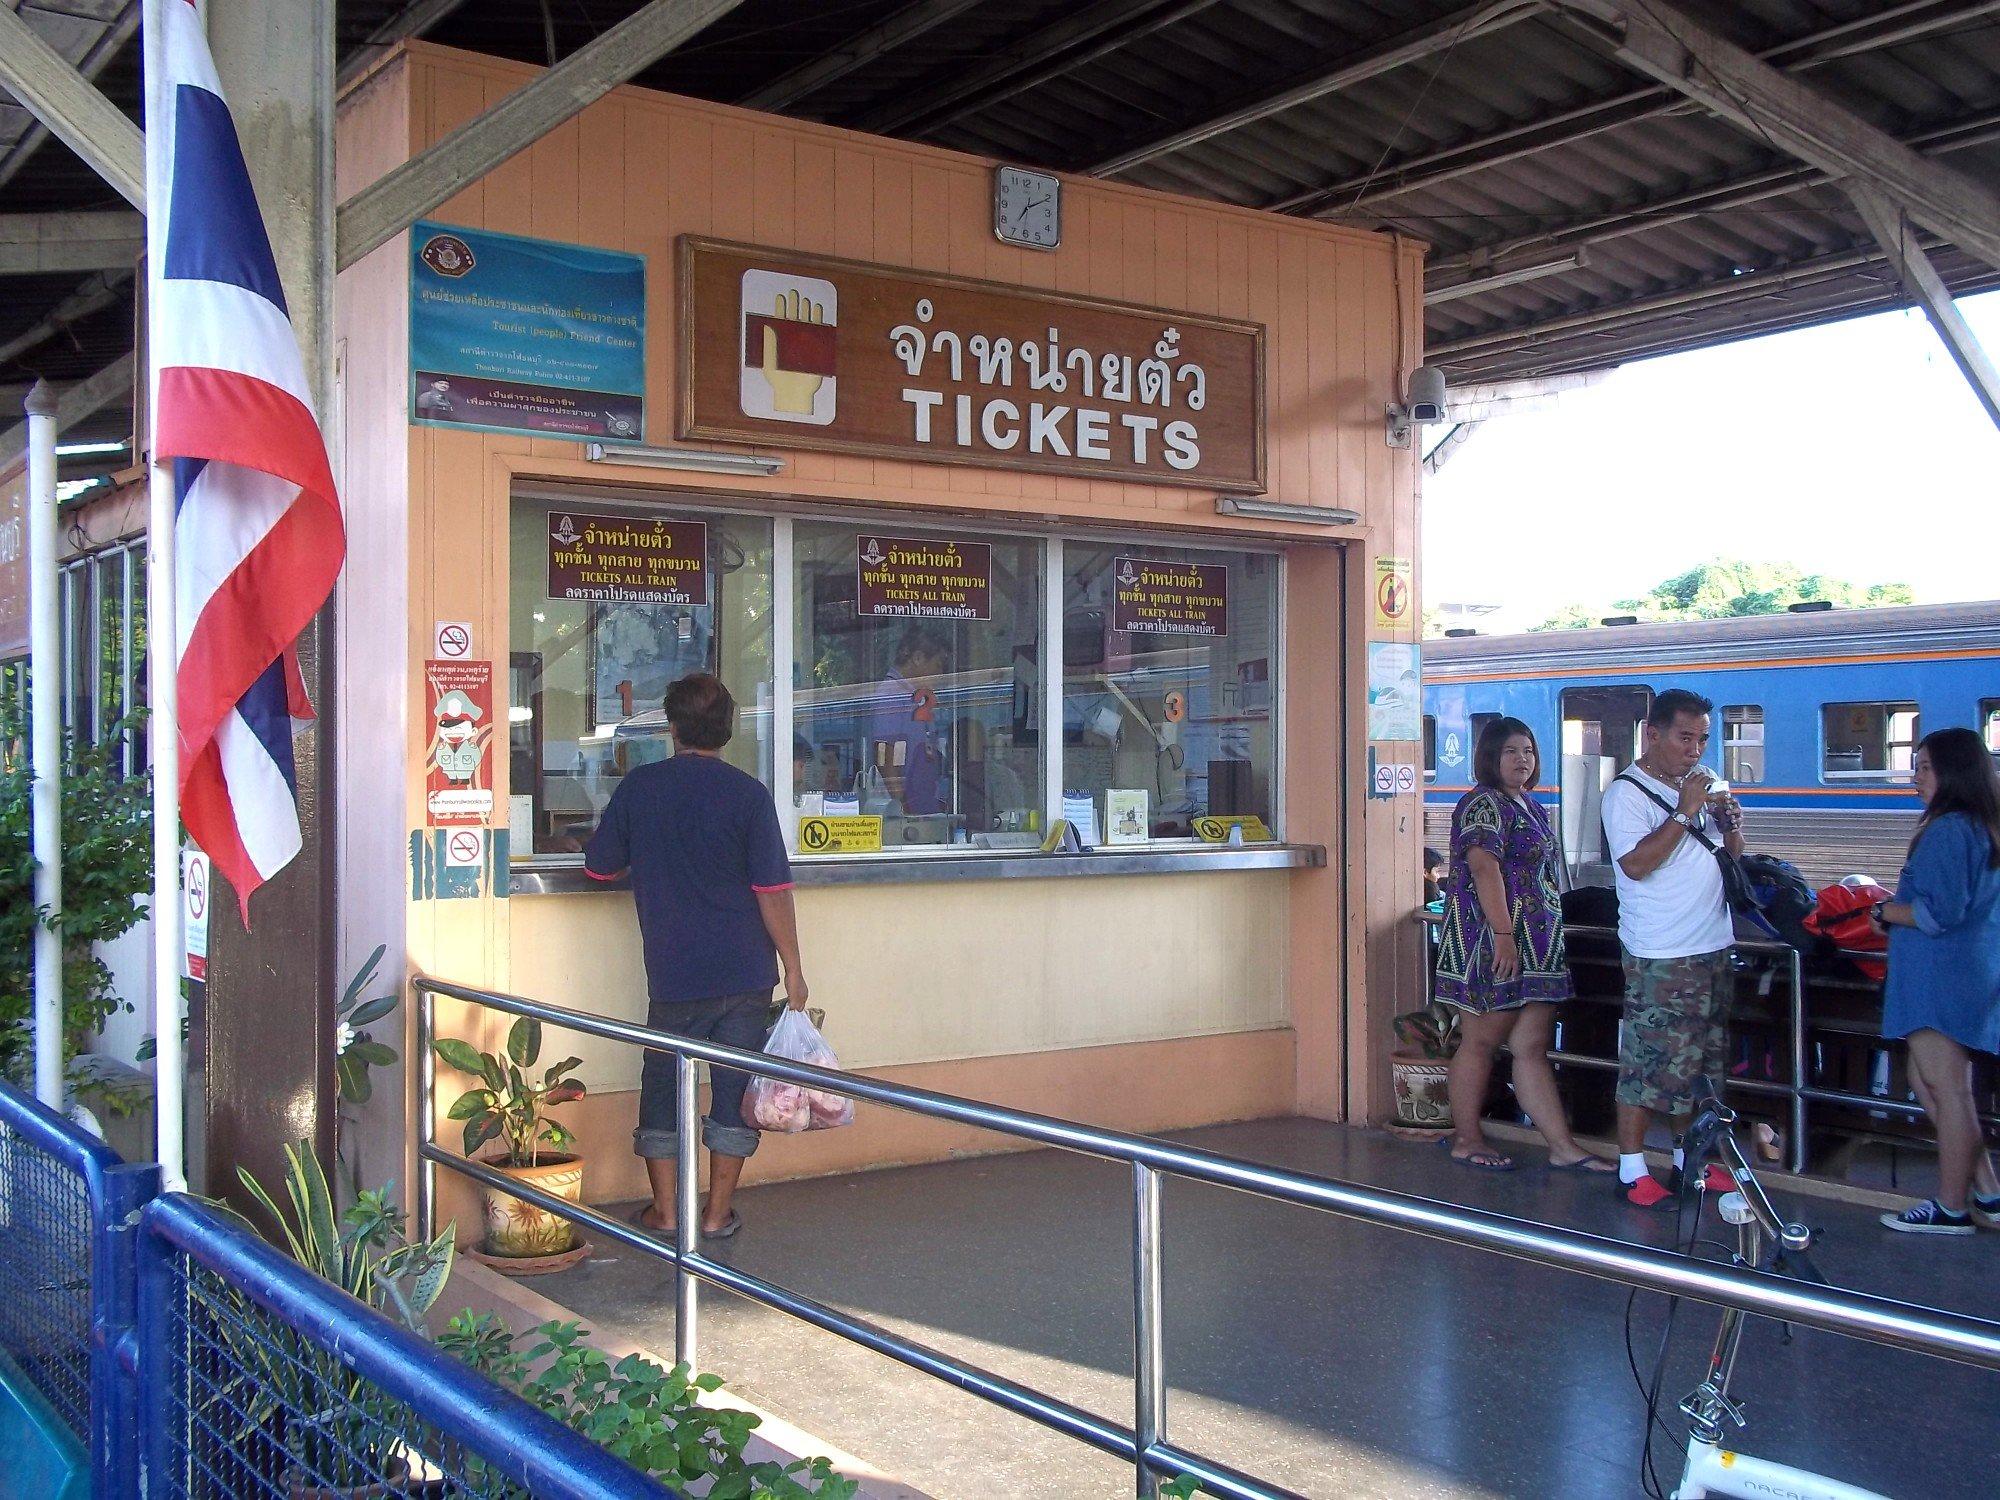 Ticket Office at Thonburi Railway Station